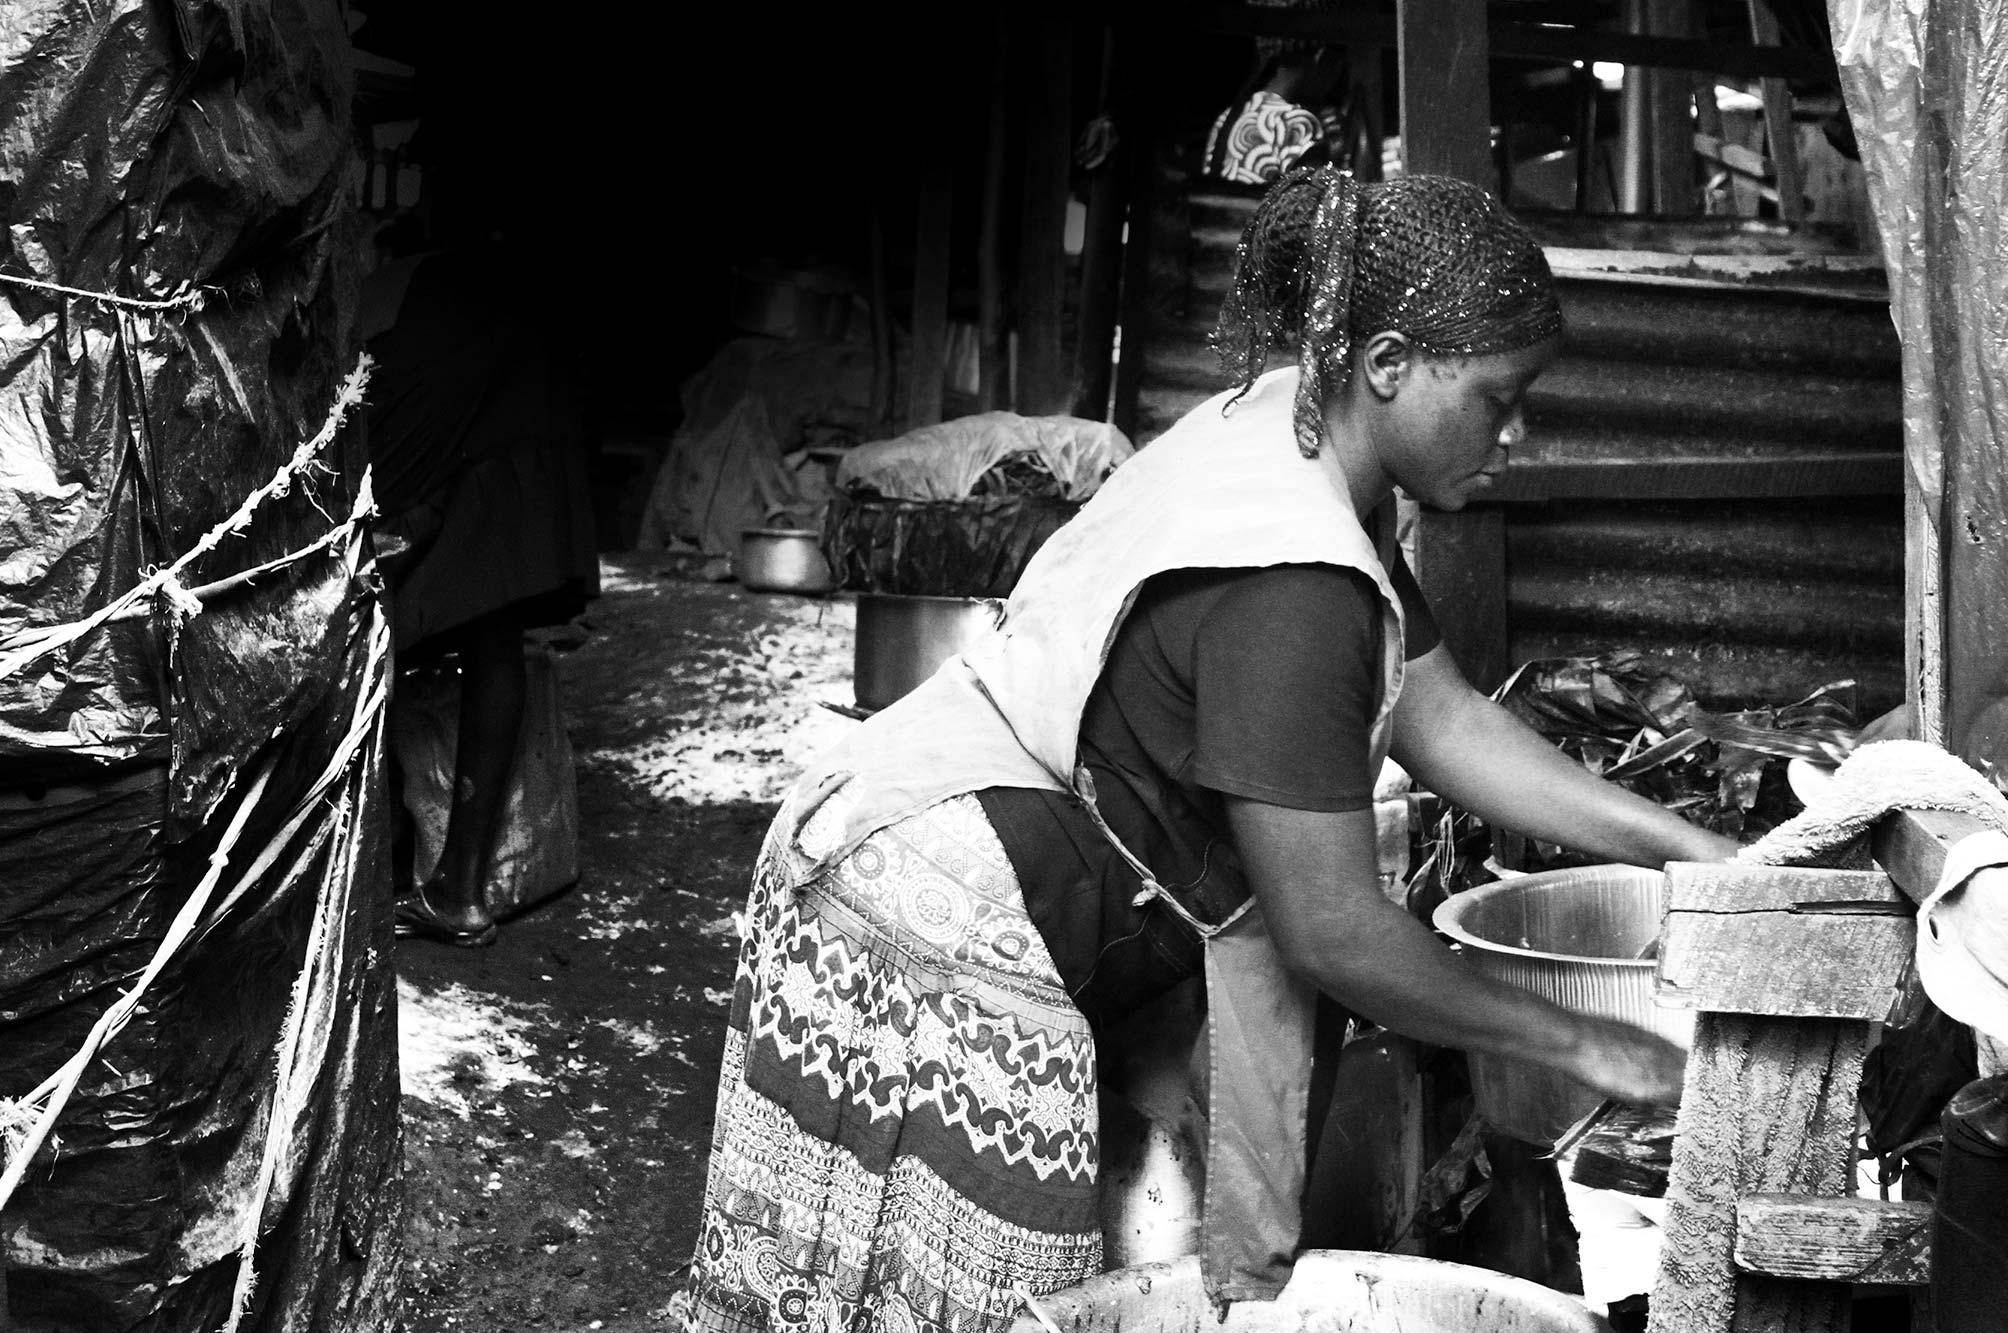 Uganda lady washing pots